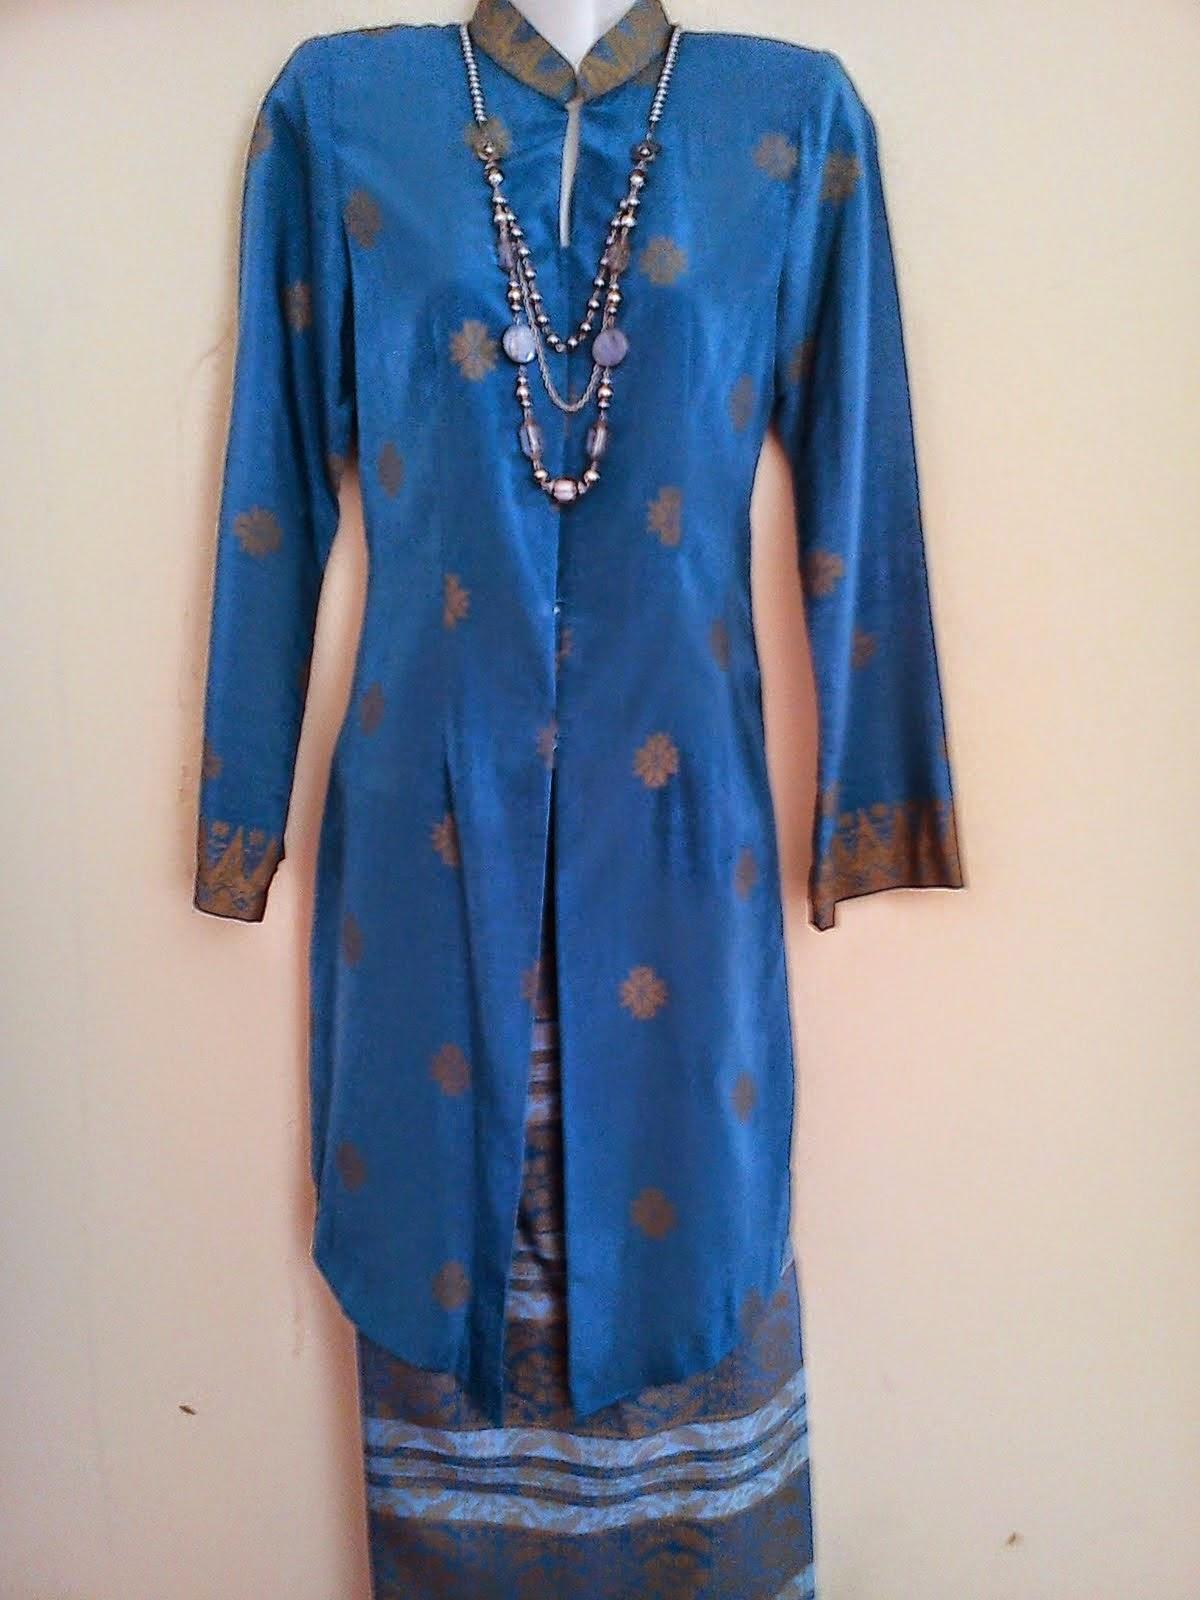 Kumpulan Foto Model Baju Kebaya Songket Online - Trend ...